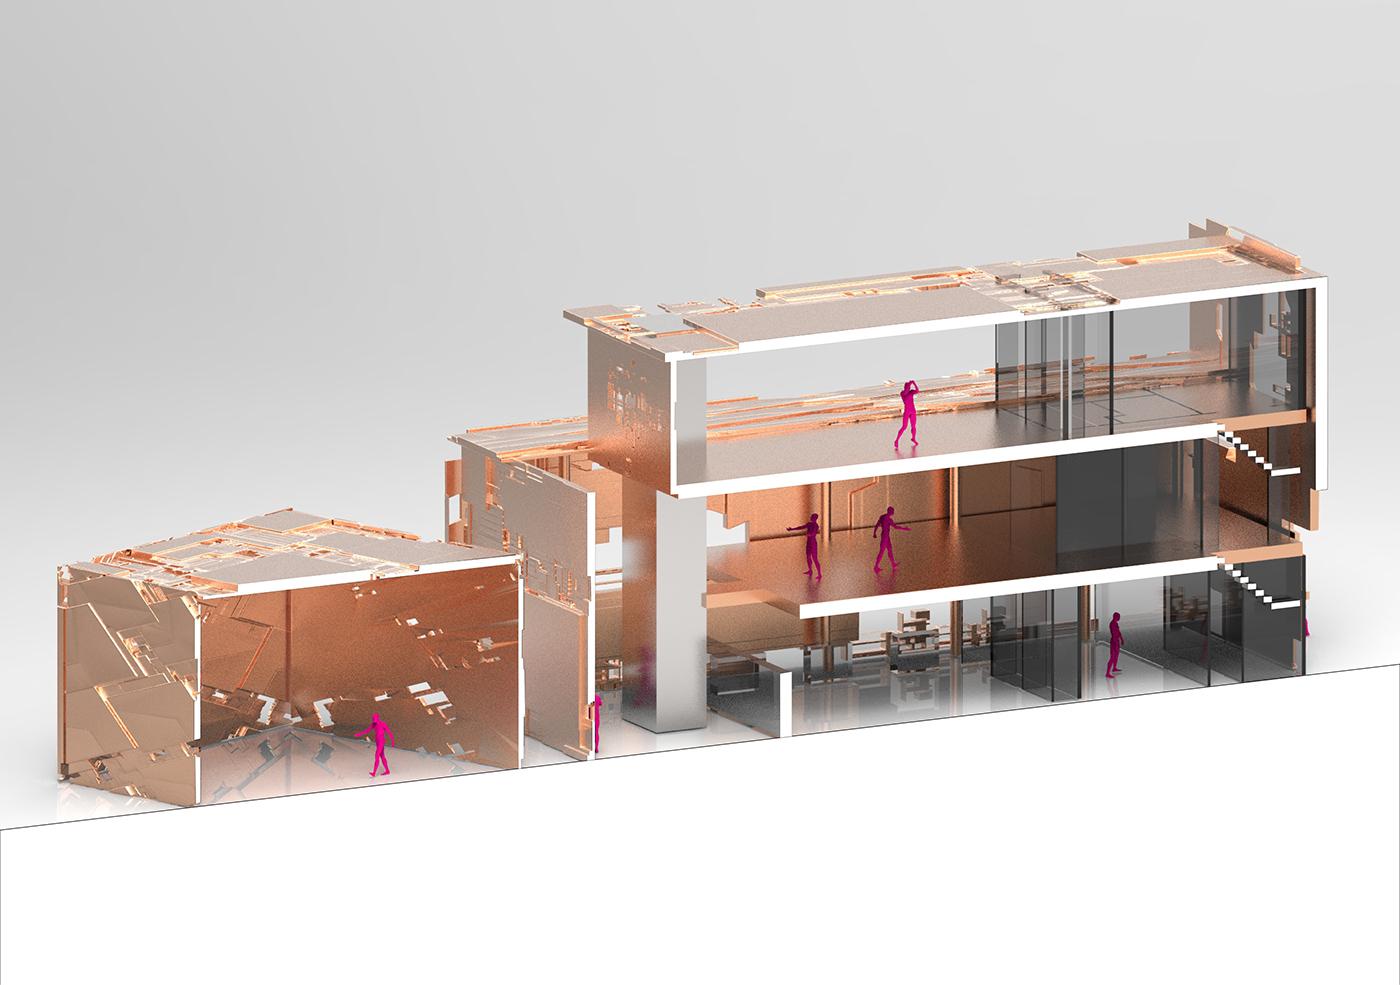 architecture commercial Glitch taxonomy